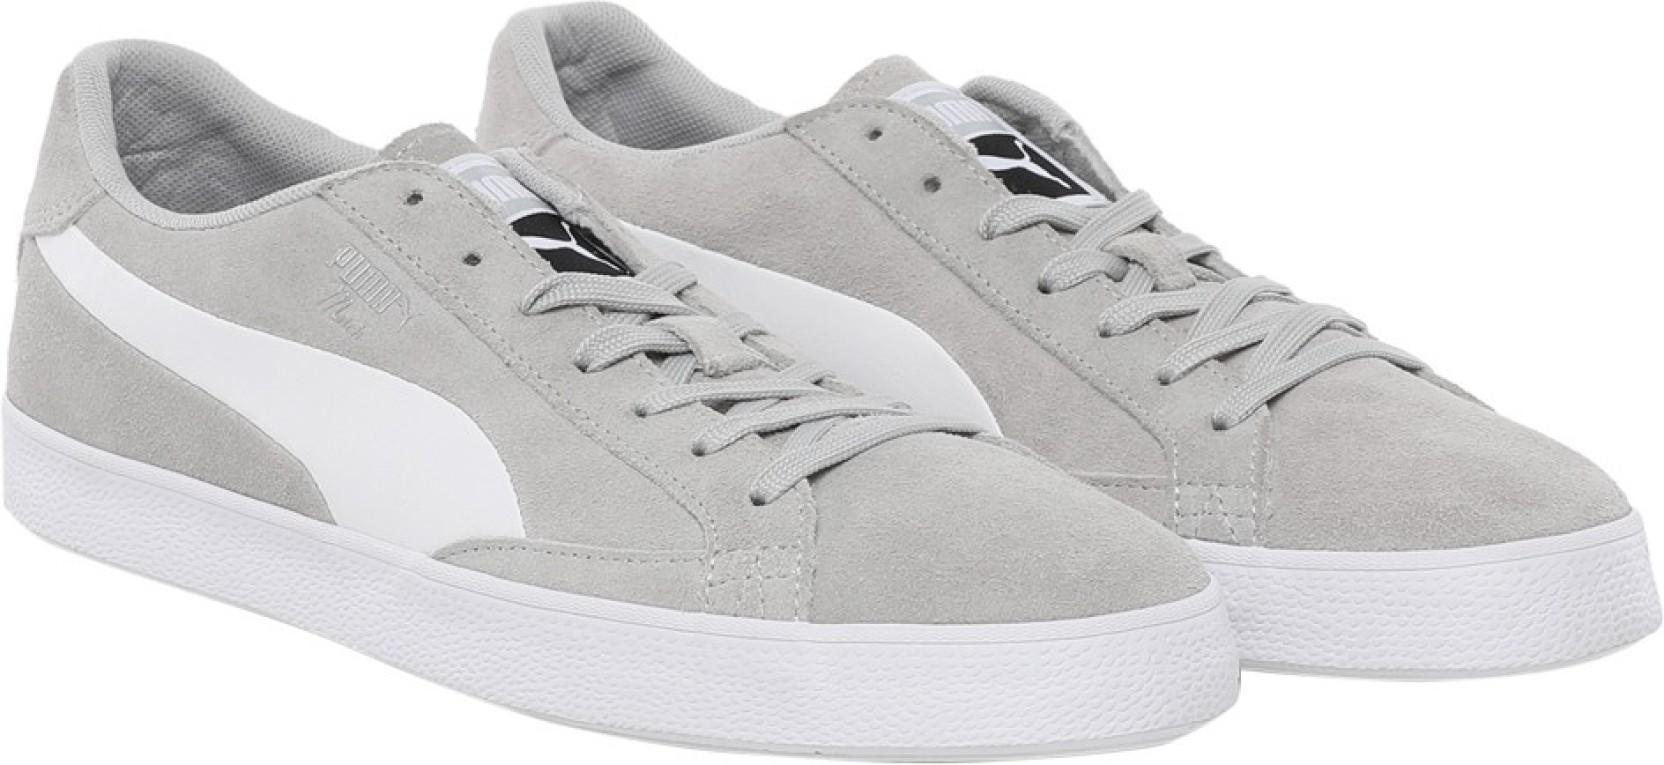 bd39b0a431c Puma Match Vulc 2 Sneakers For Men - Buy Gray Violet-Puma White ...